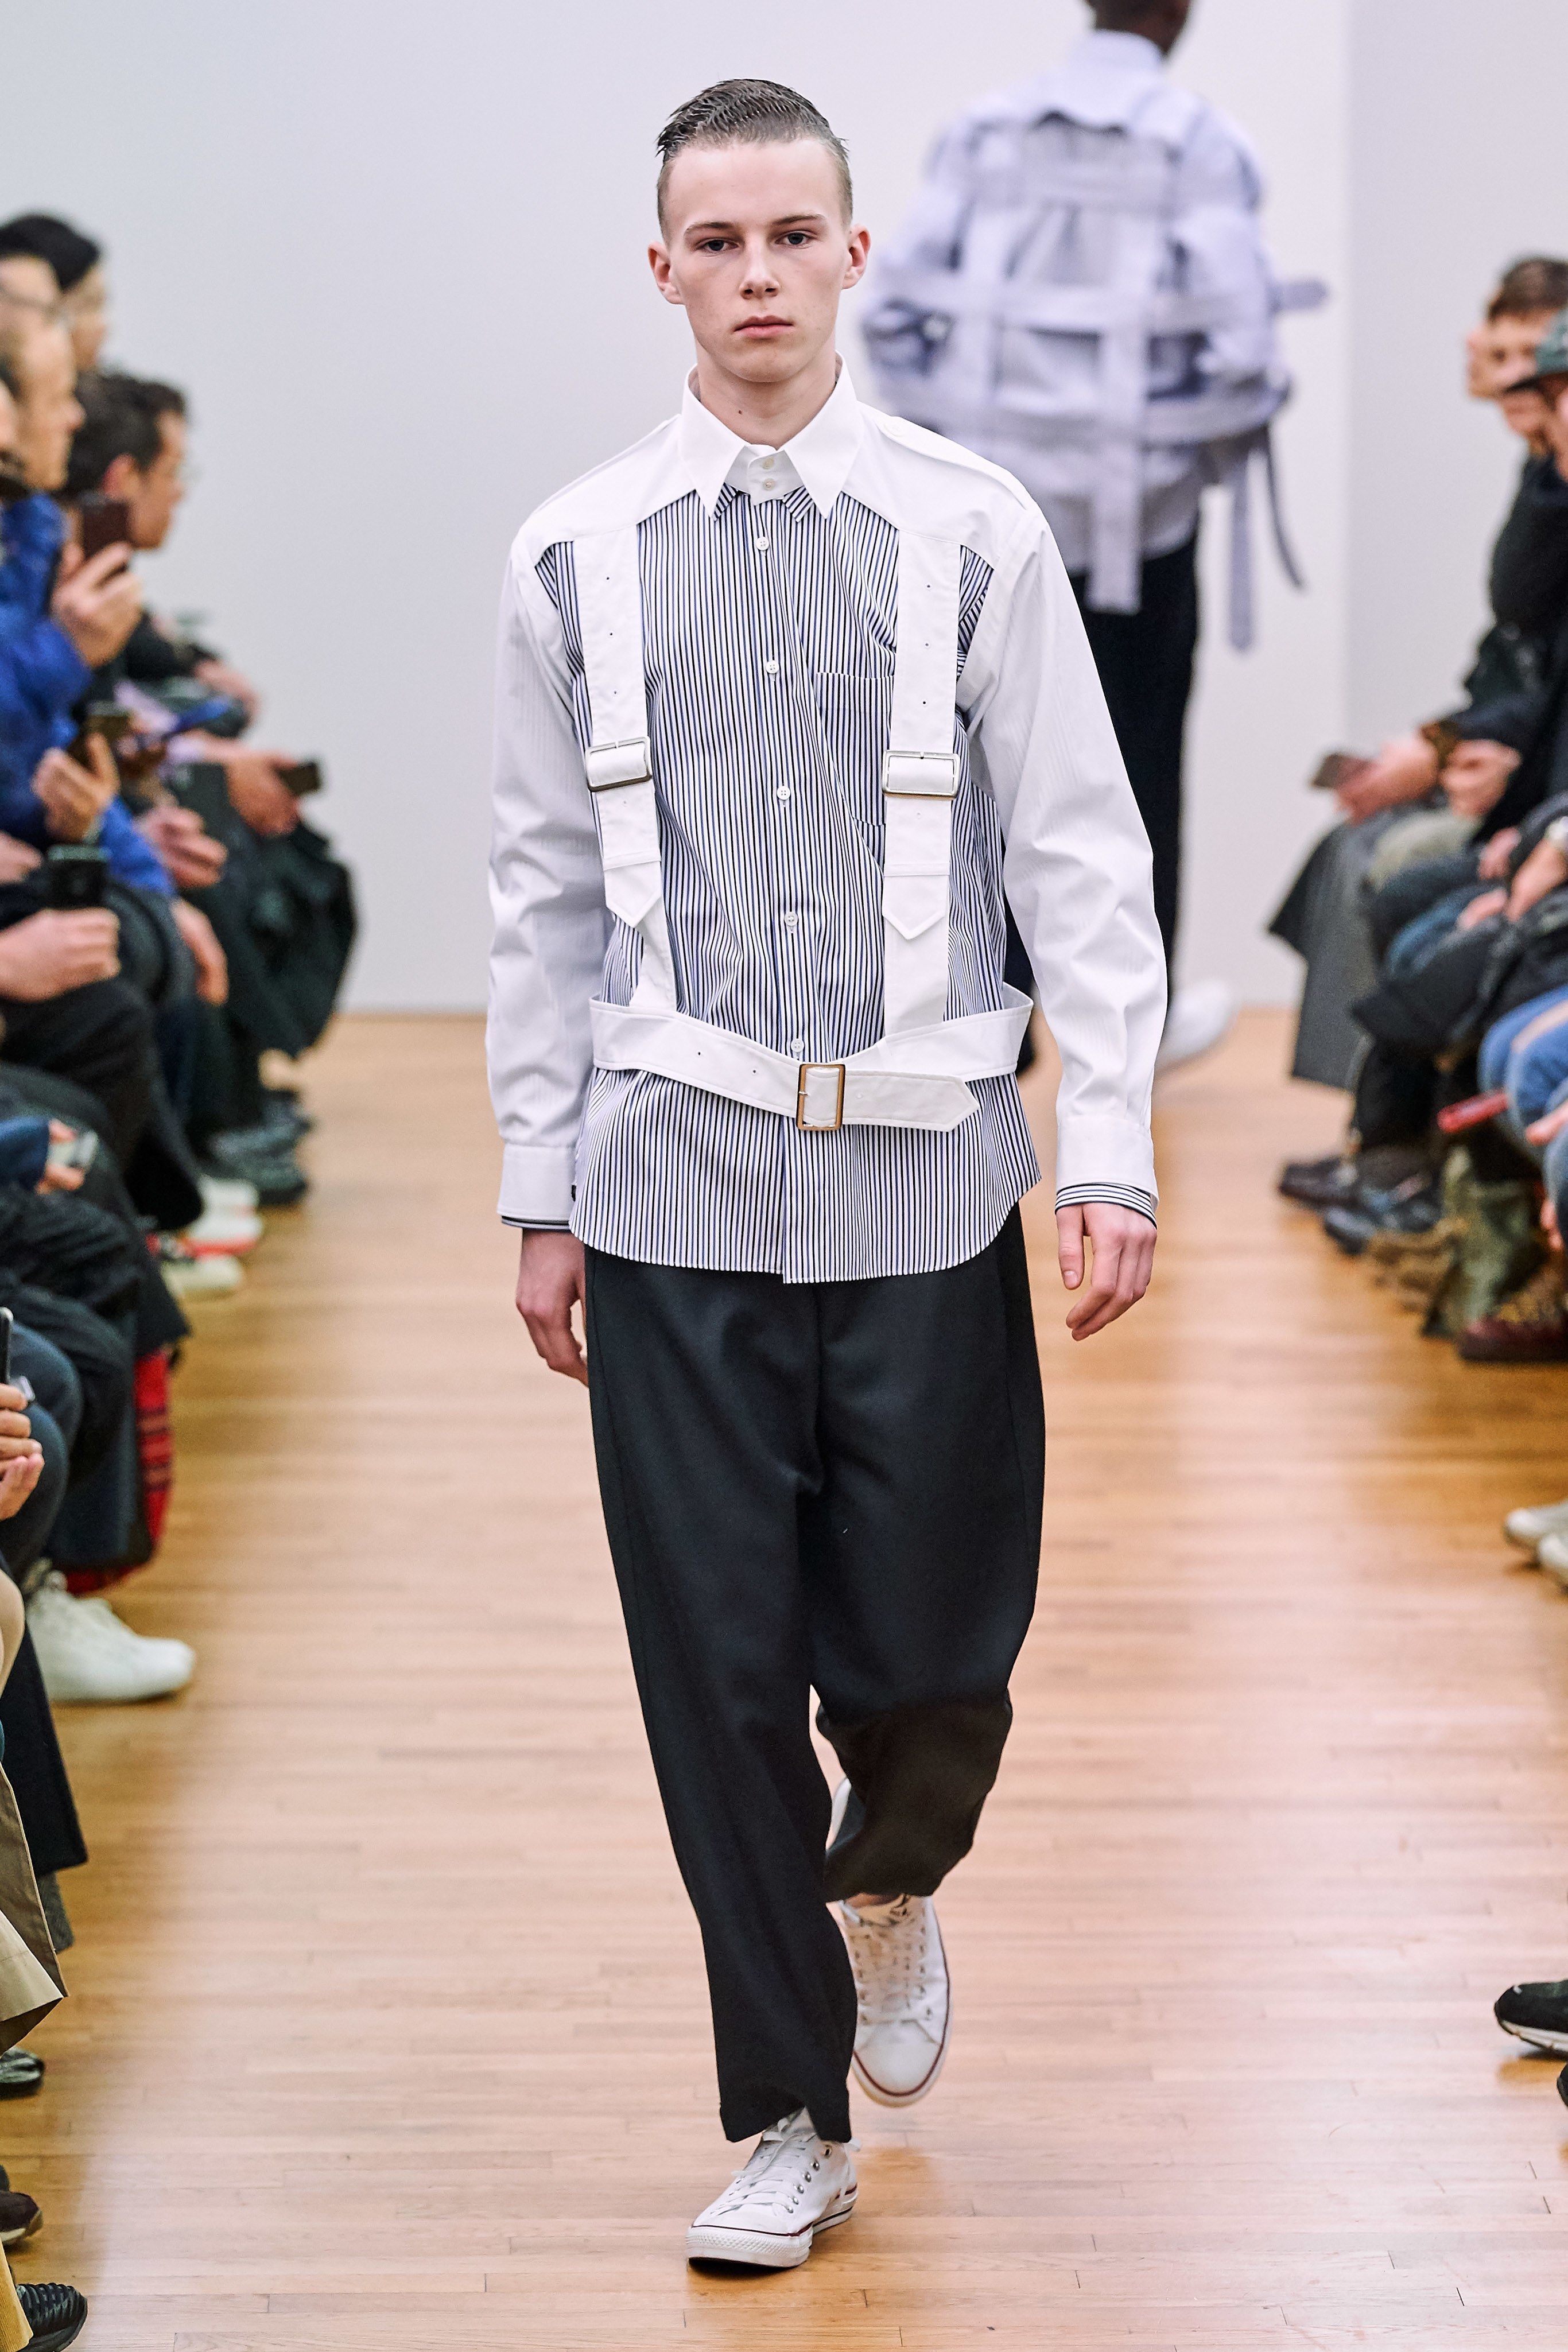 Comme des Garçons Shirt Fall 2019 Menswear Fashion Show